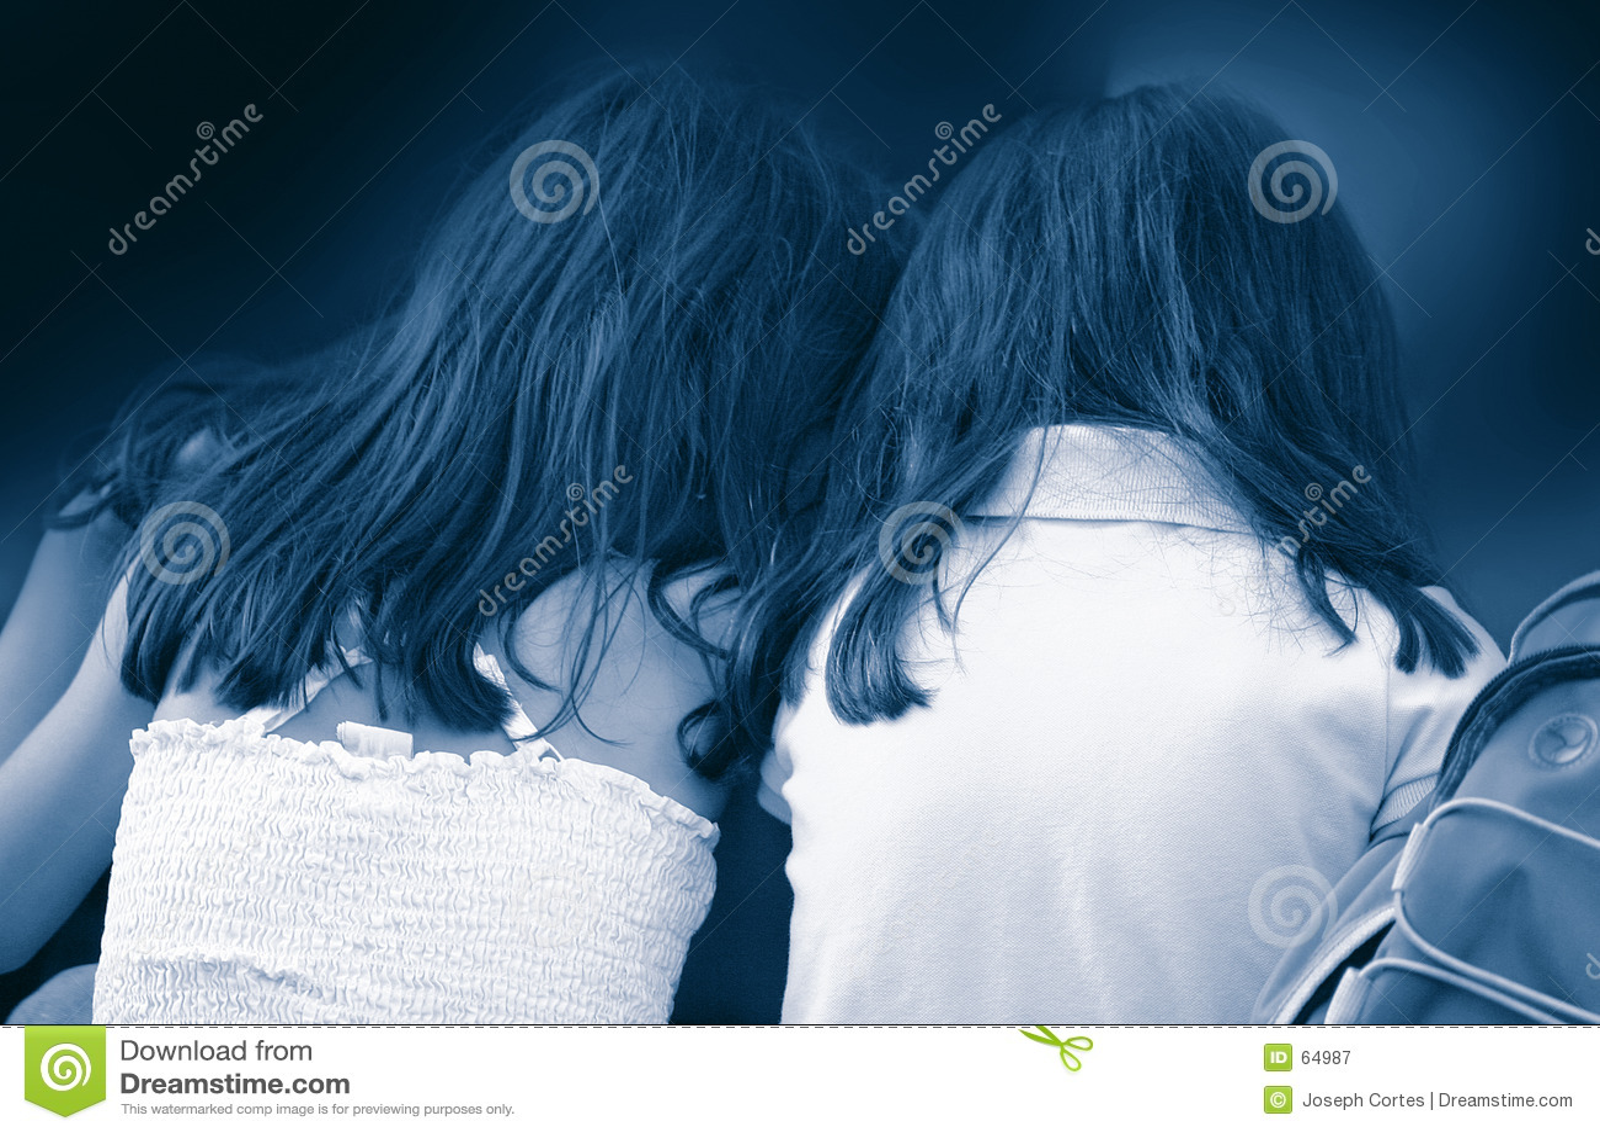 Irmãs gêmeas